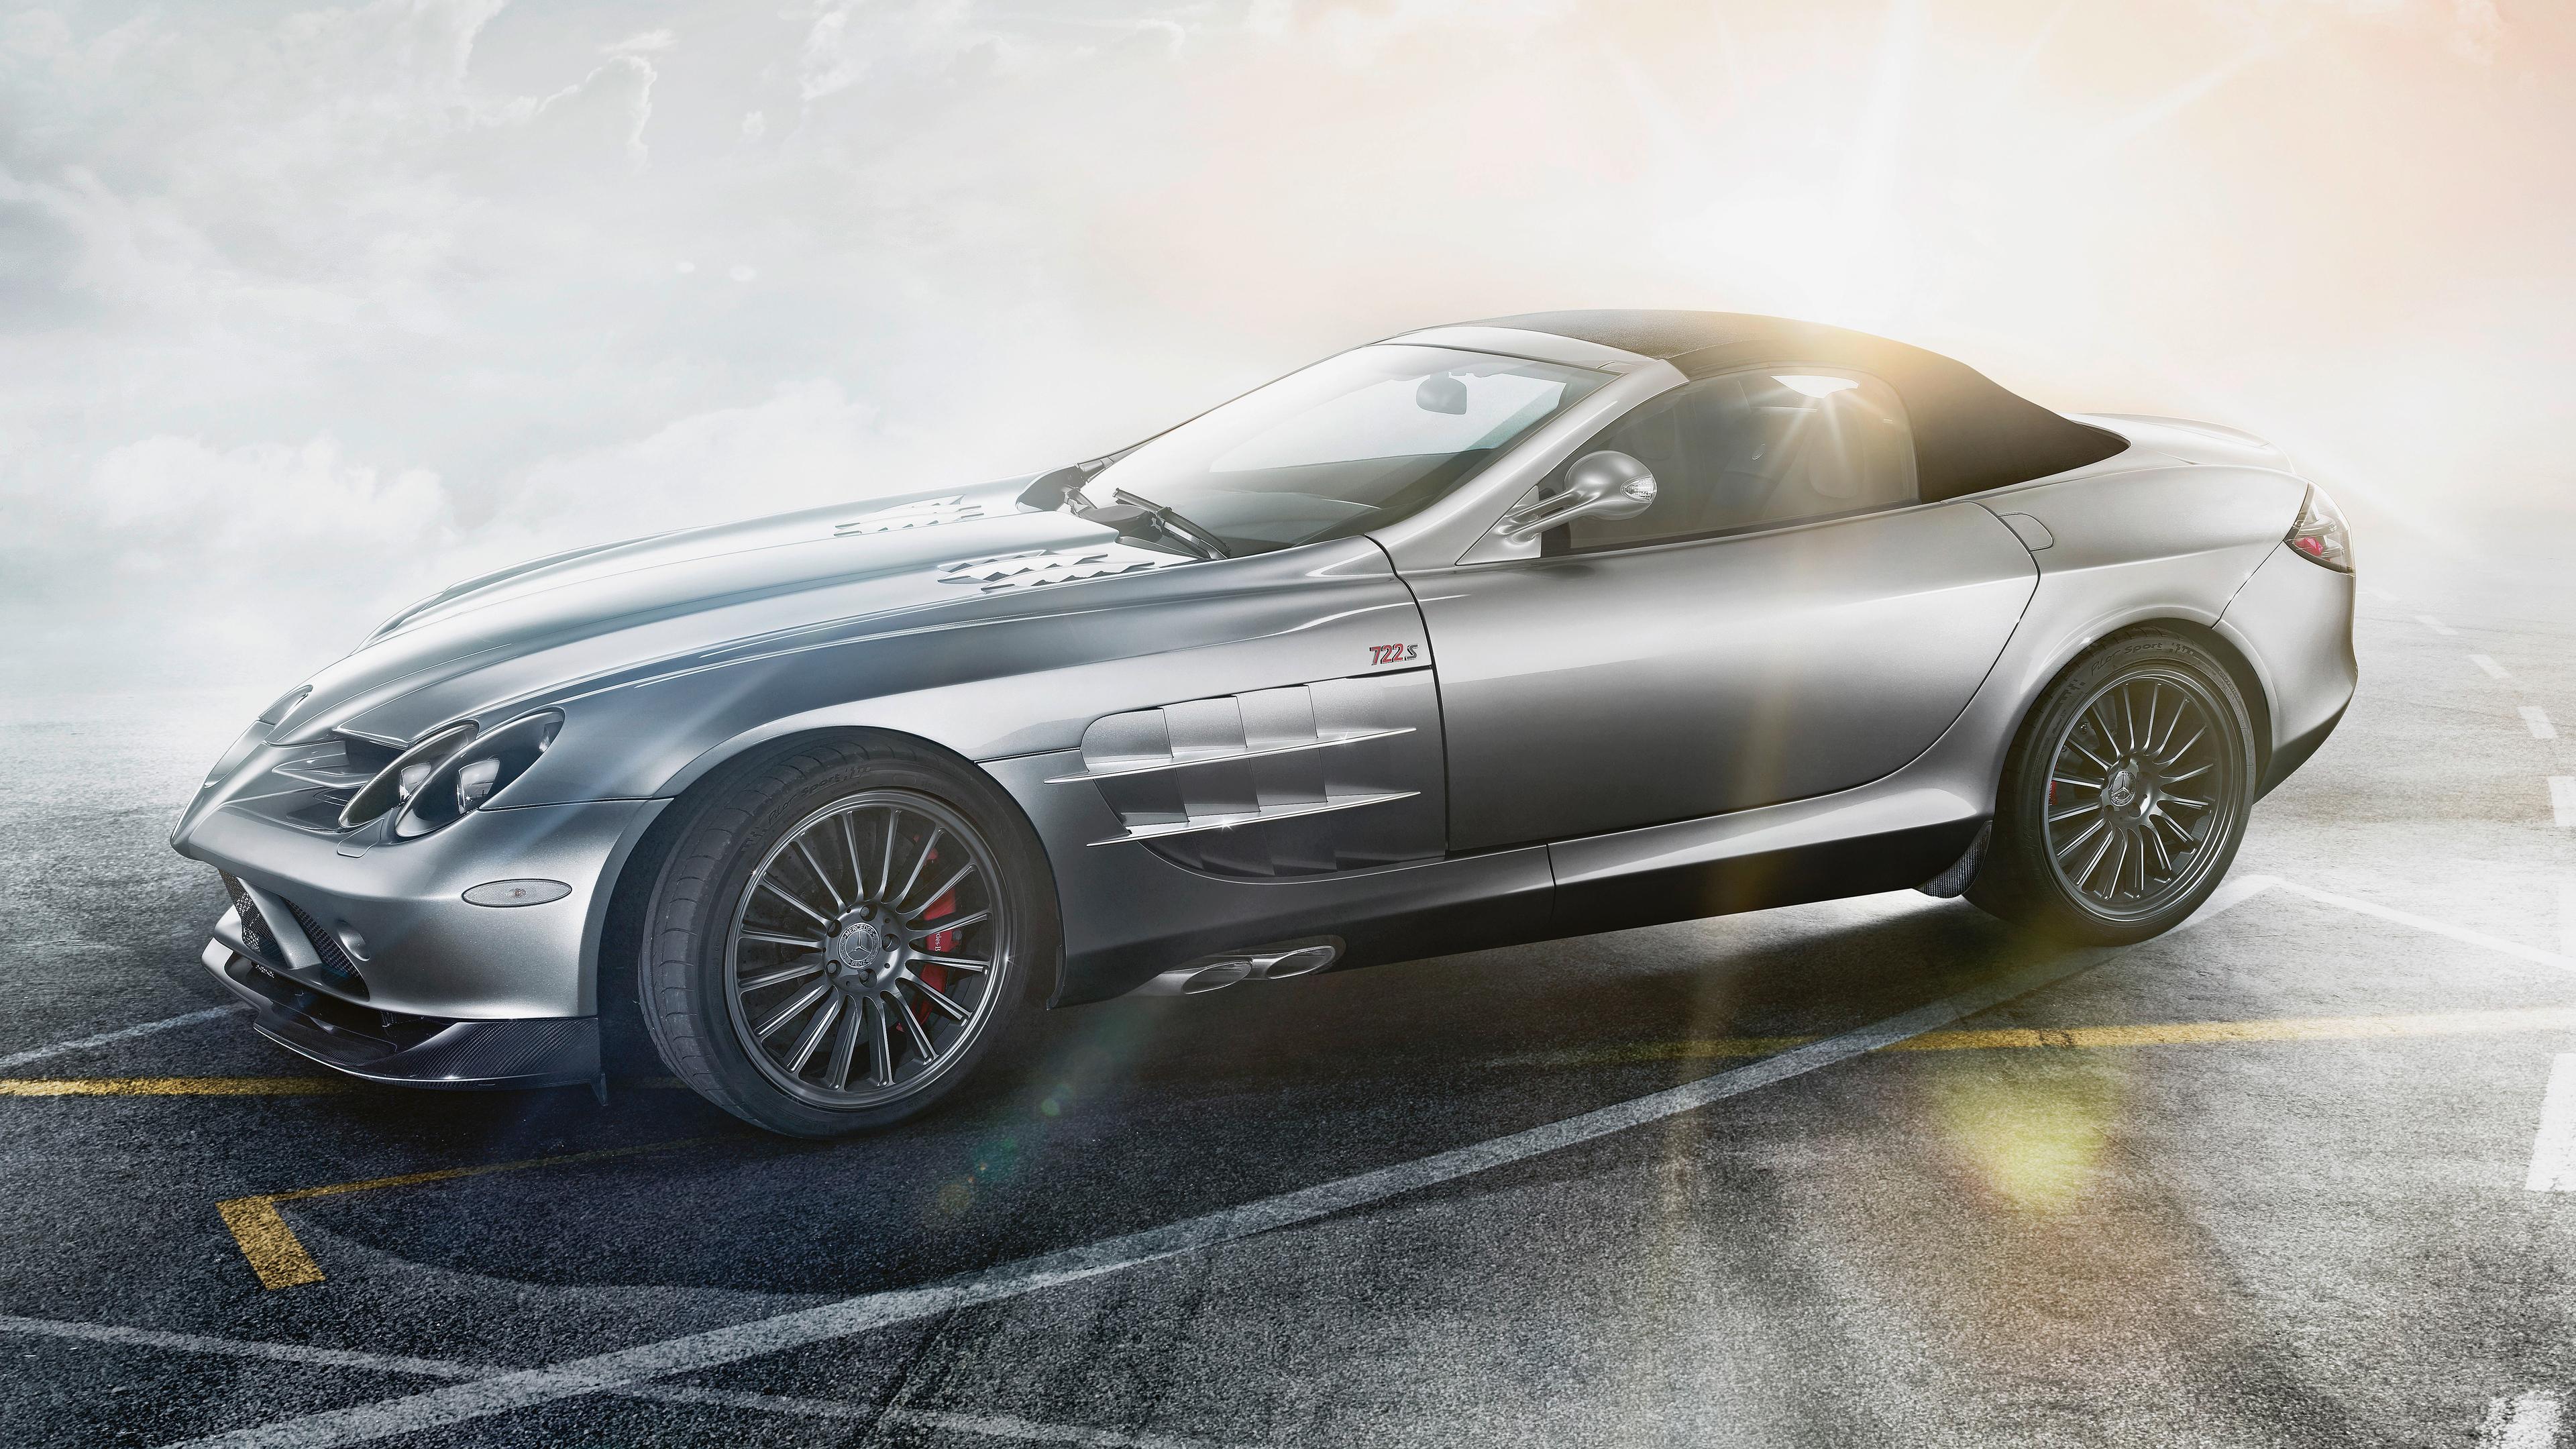 mercedes benz slr mclaren roadster 4k 1554245333 - Mercedes Benz SLR McLaren Roadster 4k - mercedes wallpapers, mercedes benz wallpapers, hd-wallpapers, cars wallpapers, 8k wallpapers, 5k wallpapers, 4k-wallpapers